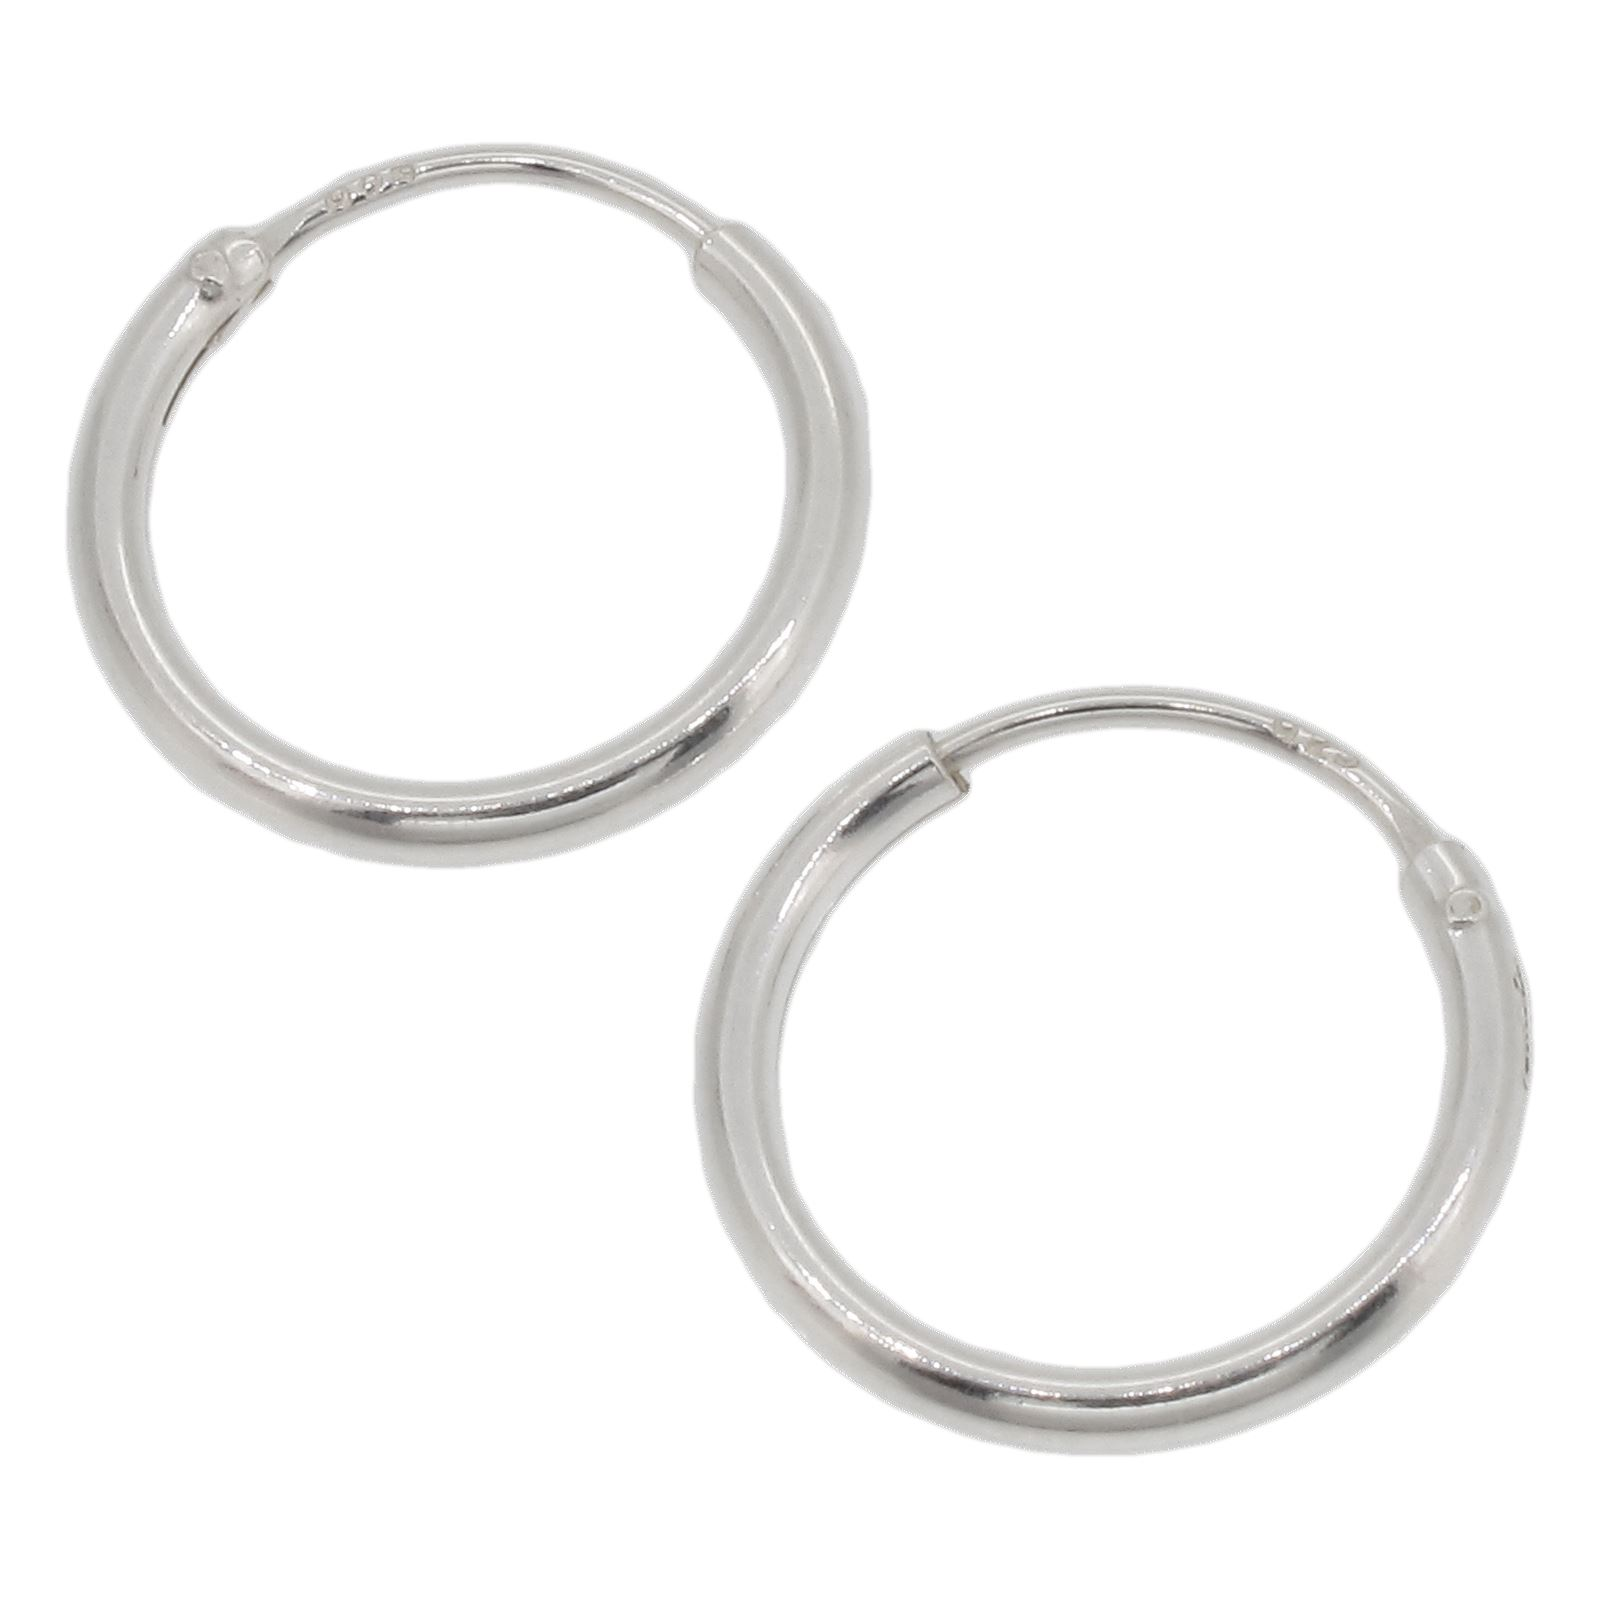 f2937c0c5 Details about Sterling Silver 12mm Hoop Earrings - PAIR - Small Hoops /  Basic Sleepers - 925